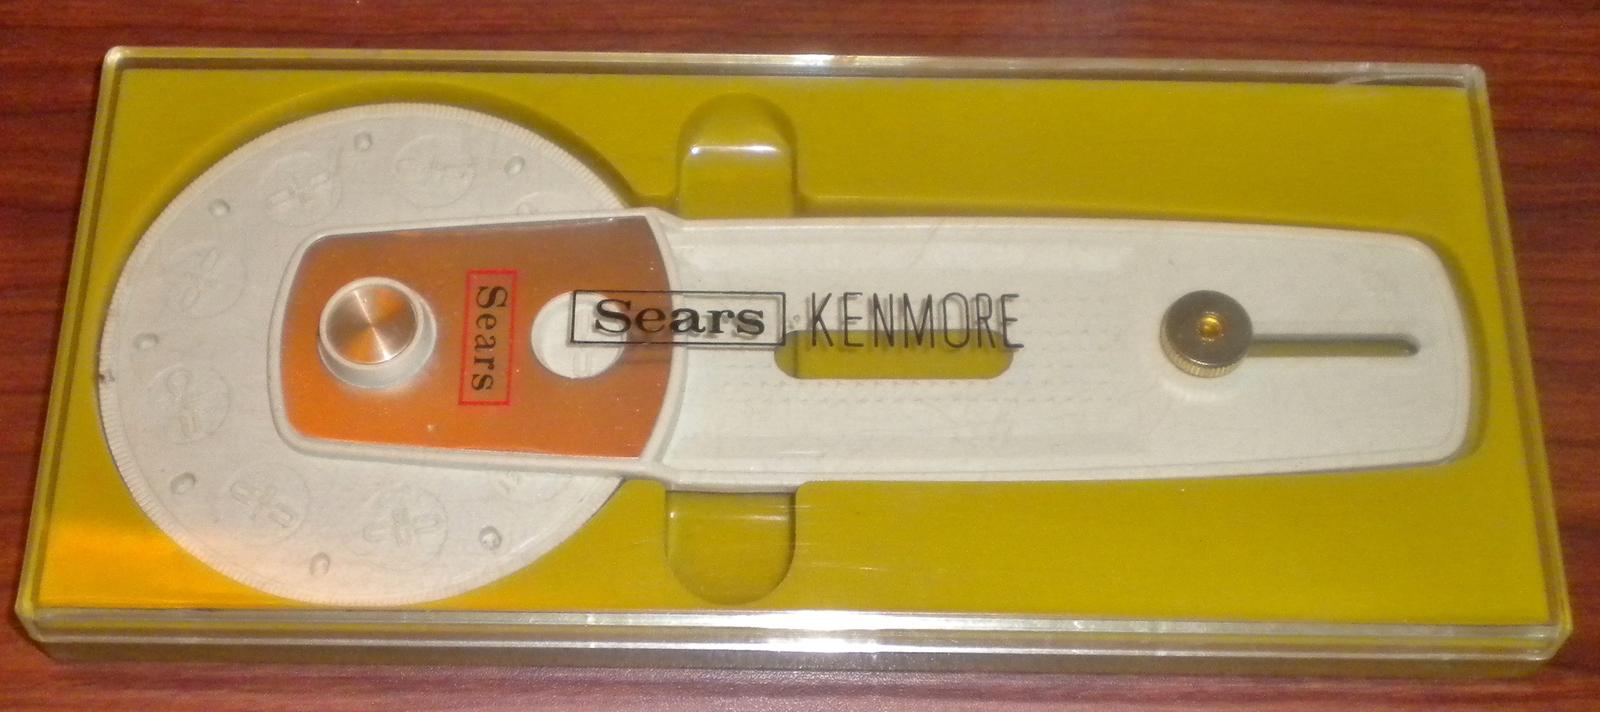 Kenmore camera coupon